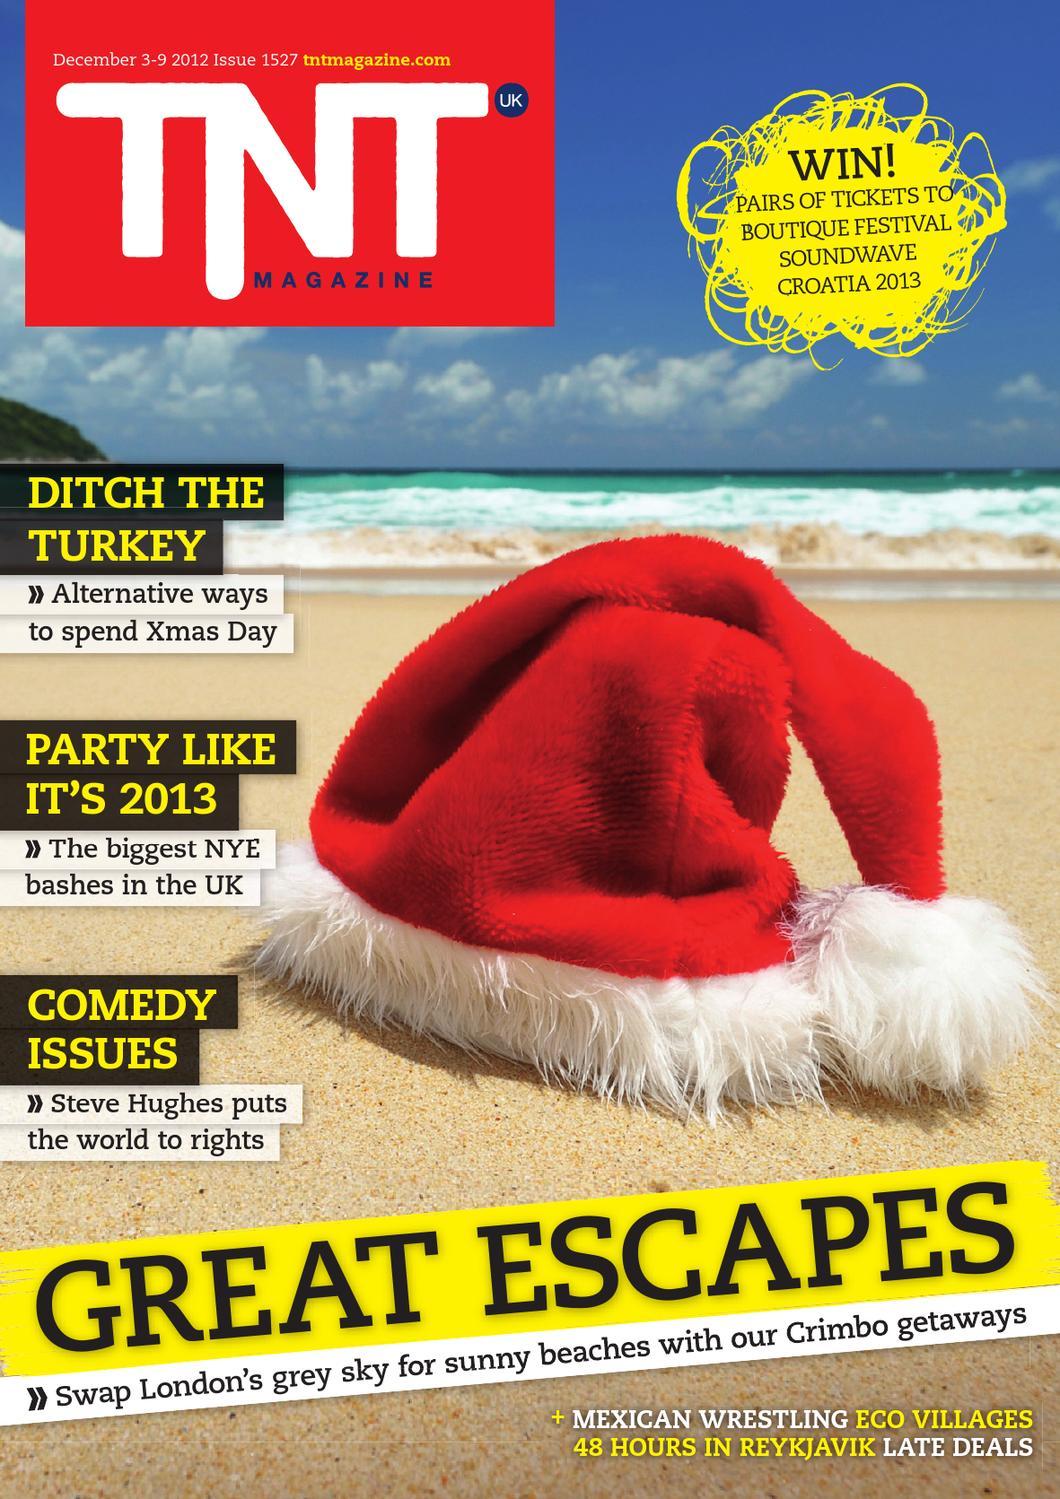 TNT Magazine Issue 1527 by TNT Magazine issuu